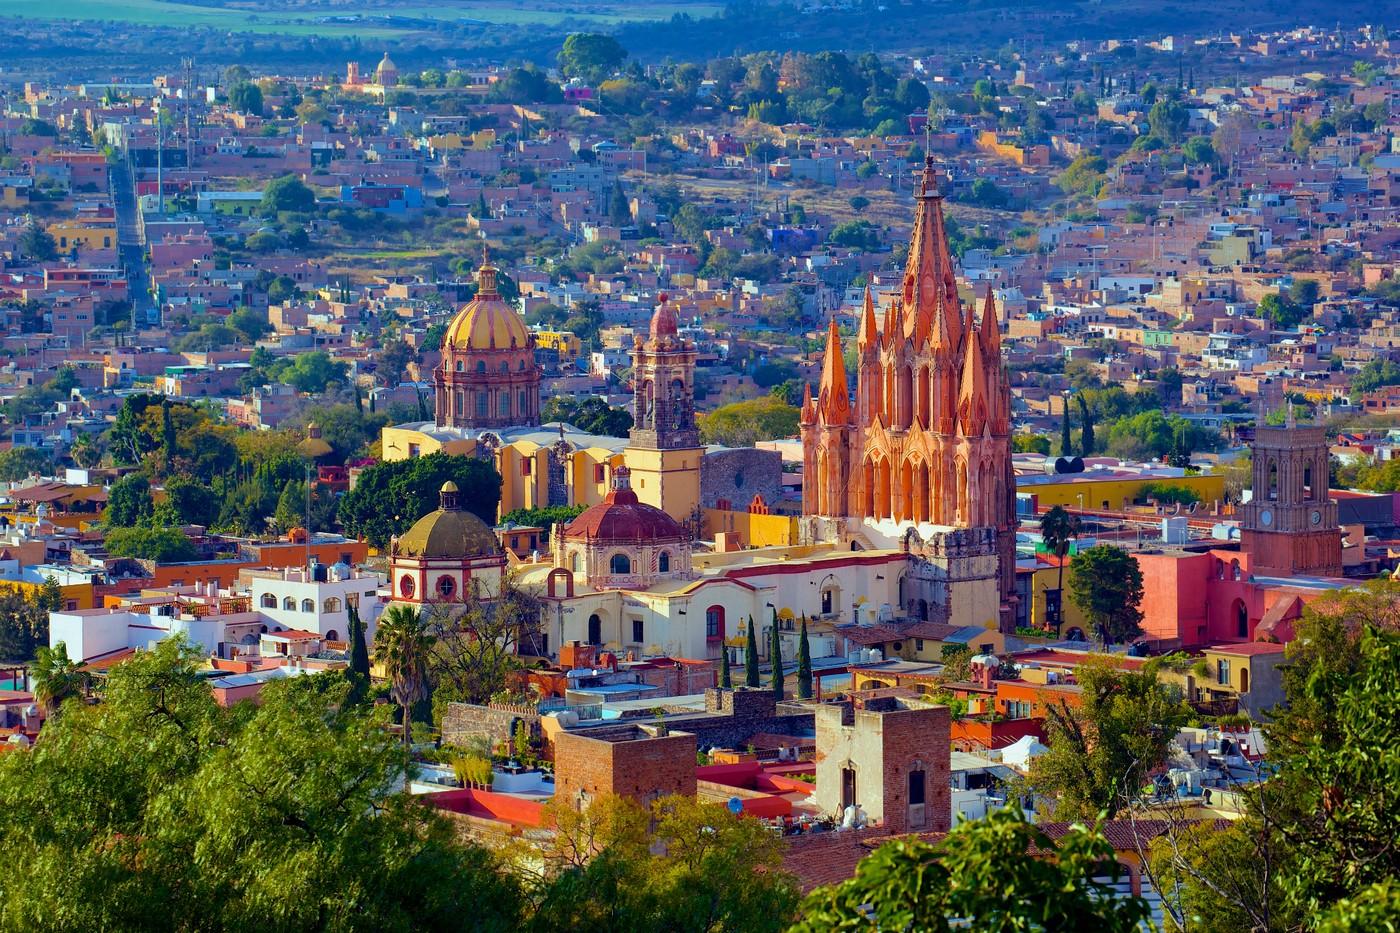 Сан-Мигель-де-Альенде, Мексика